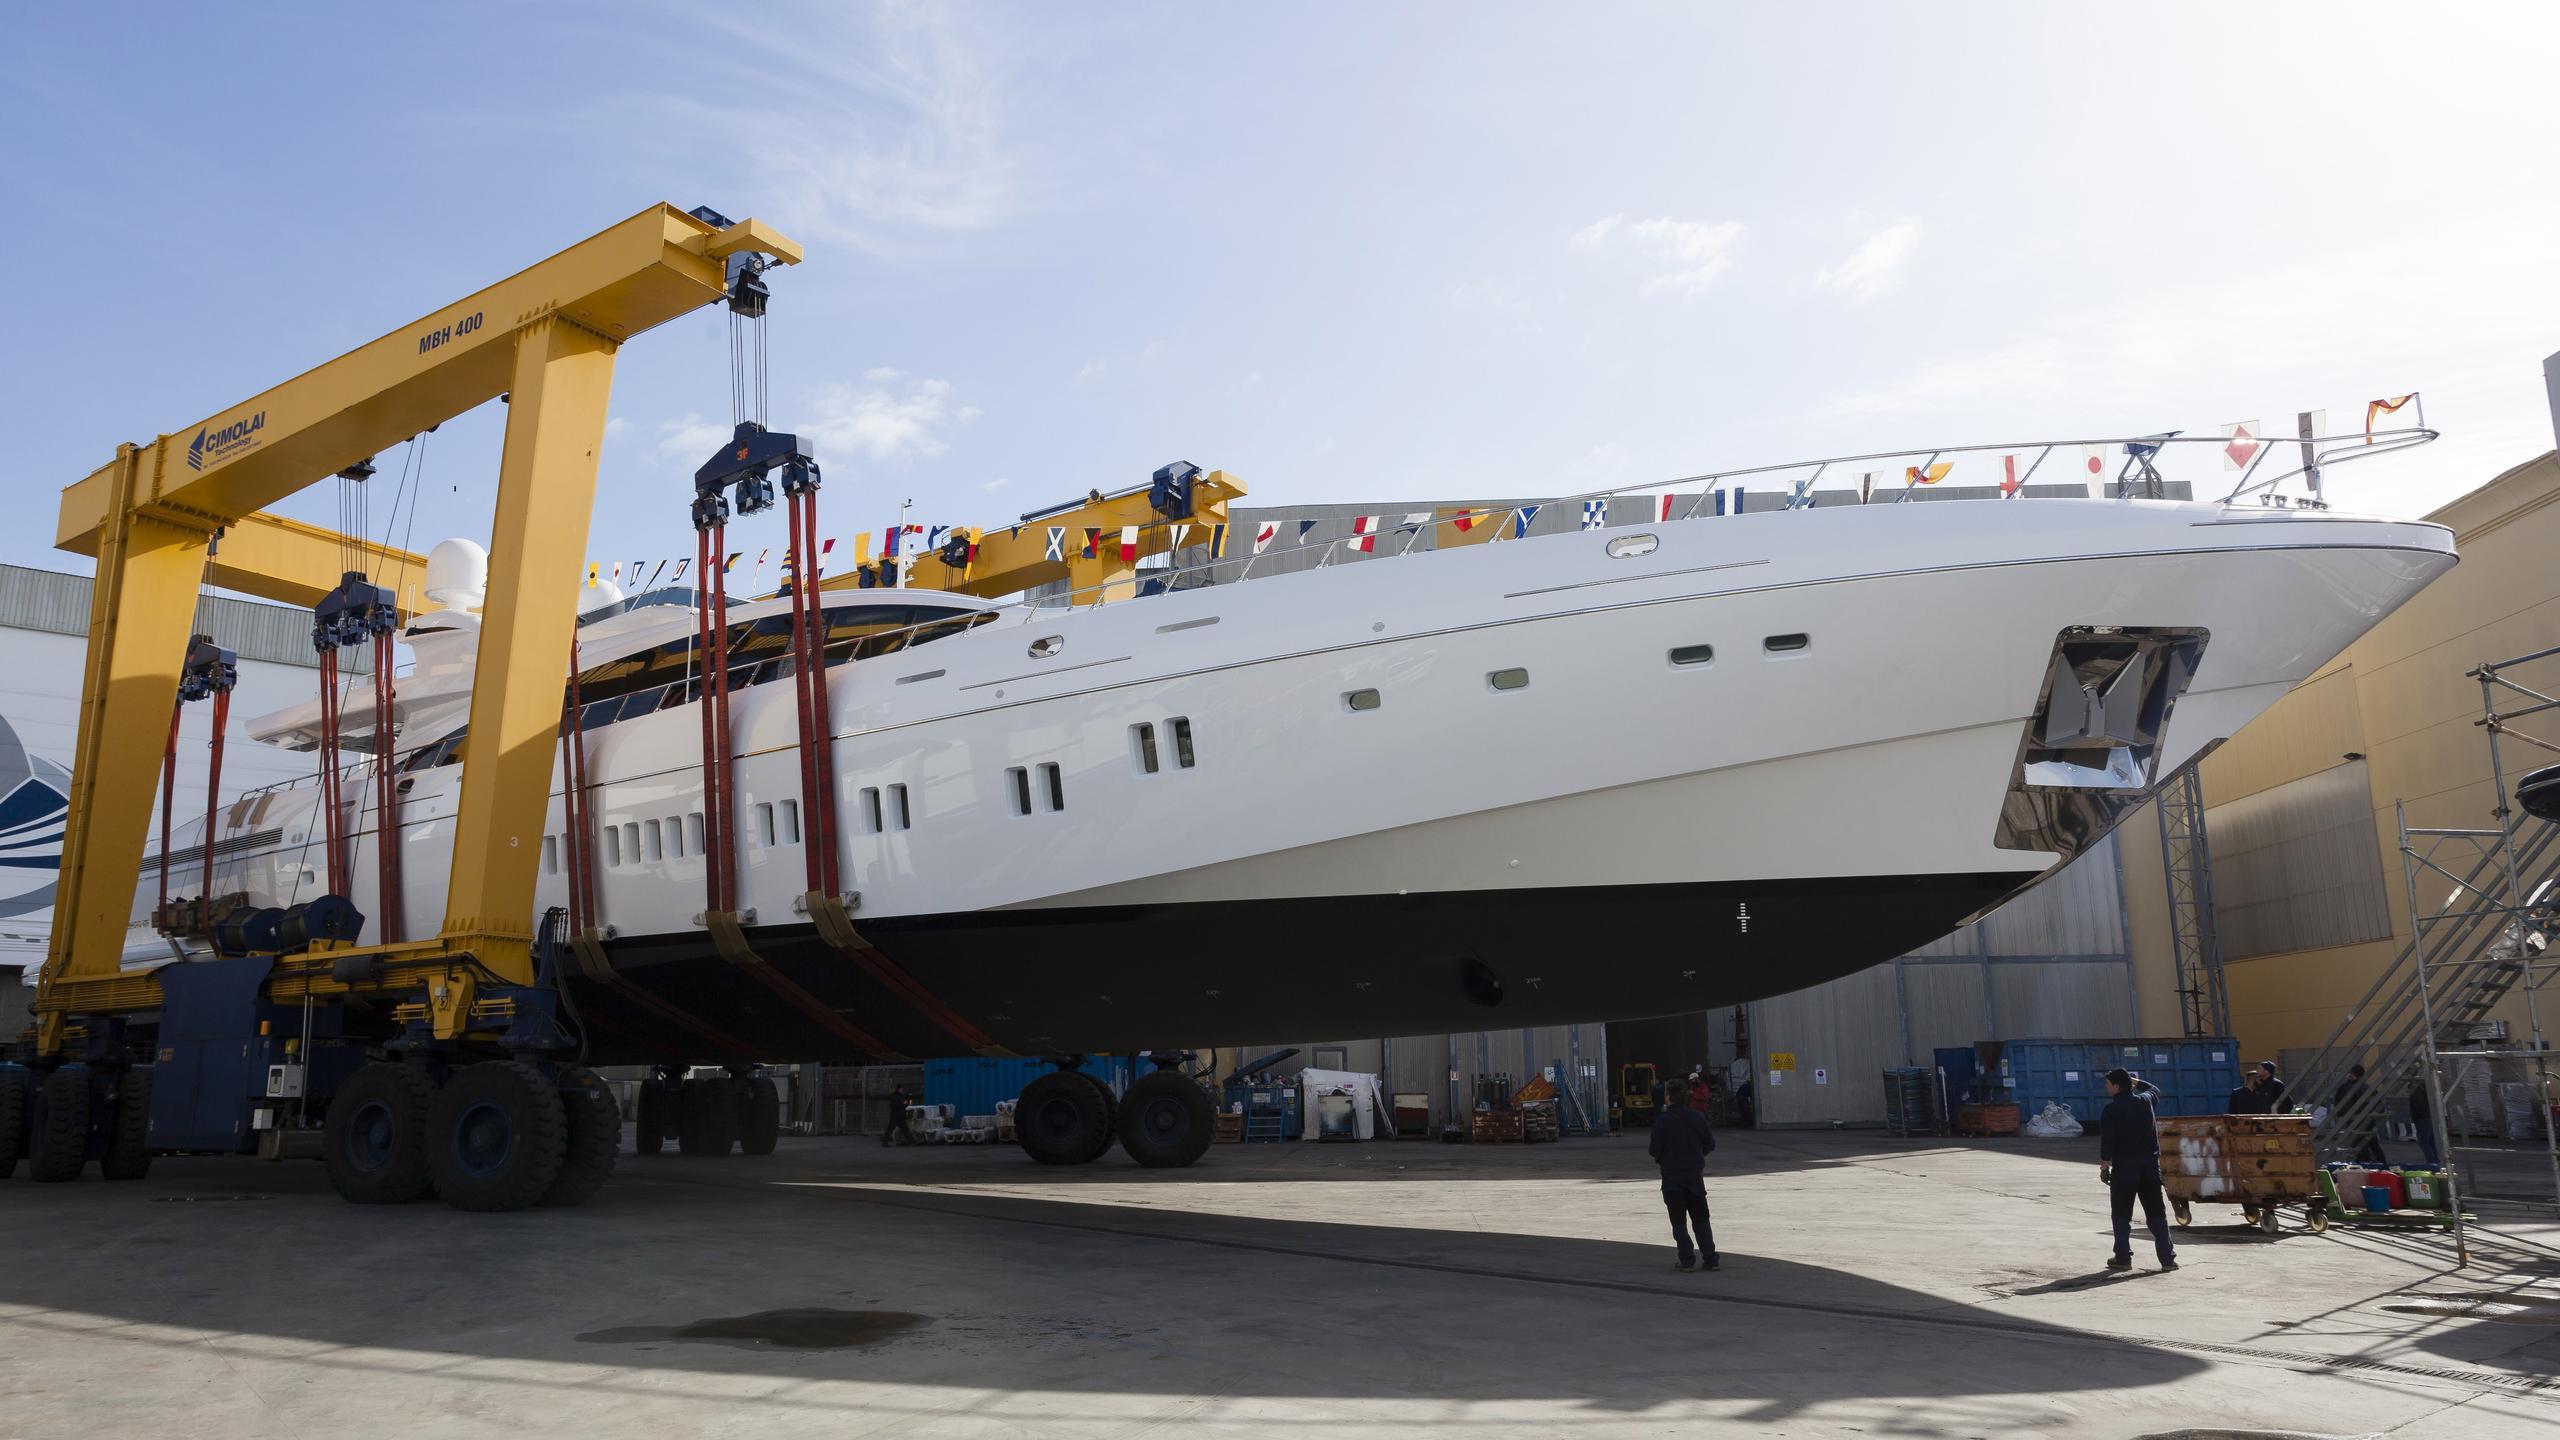 incognito-motoryacht-overmarine-mangusta-165-2016-50m-half-profile-launch